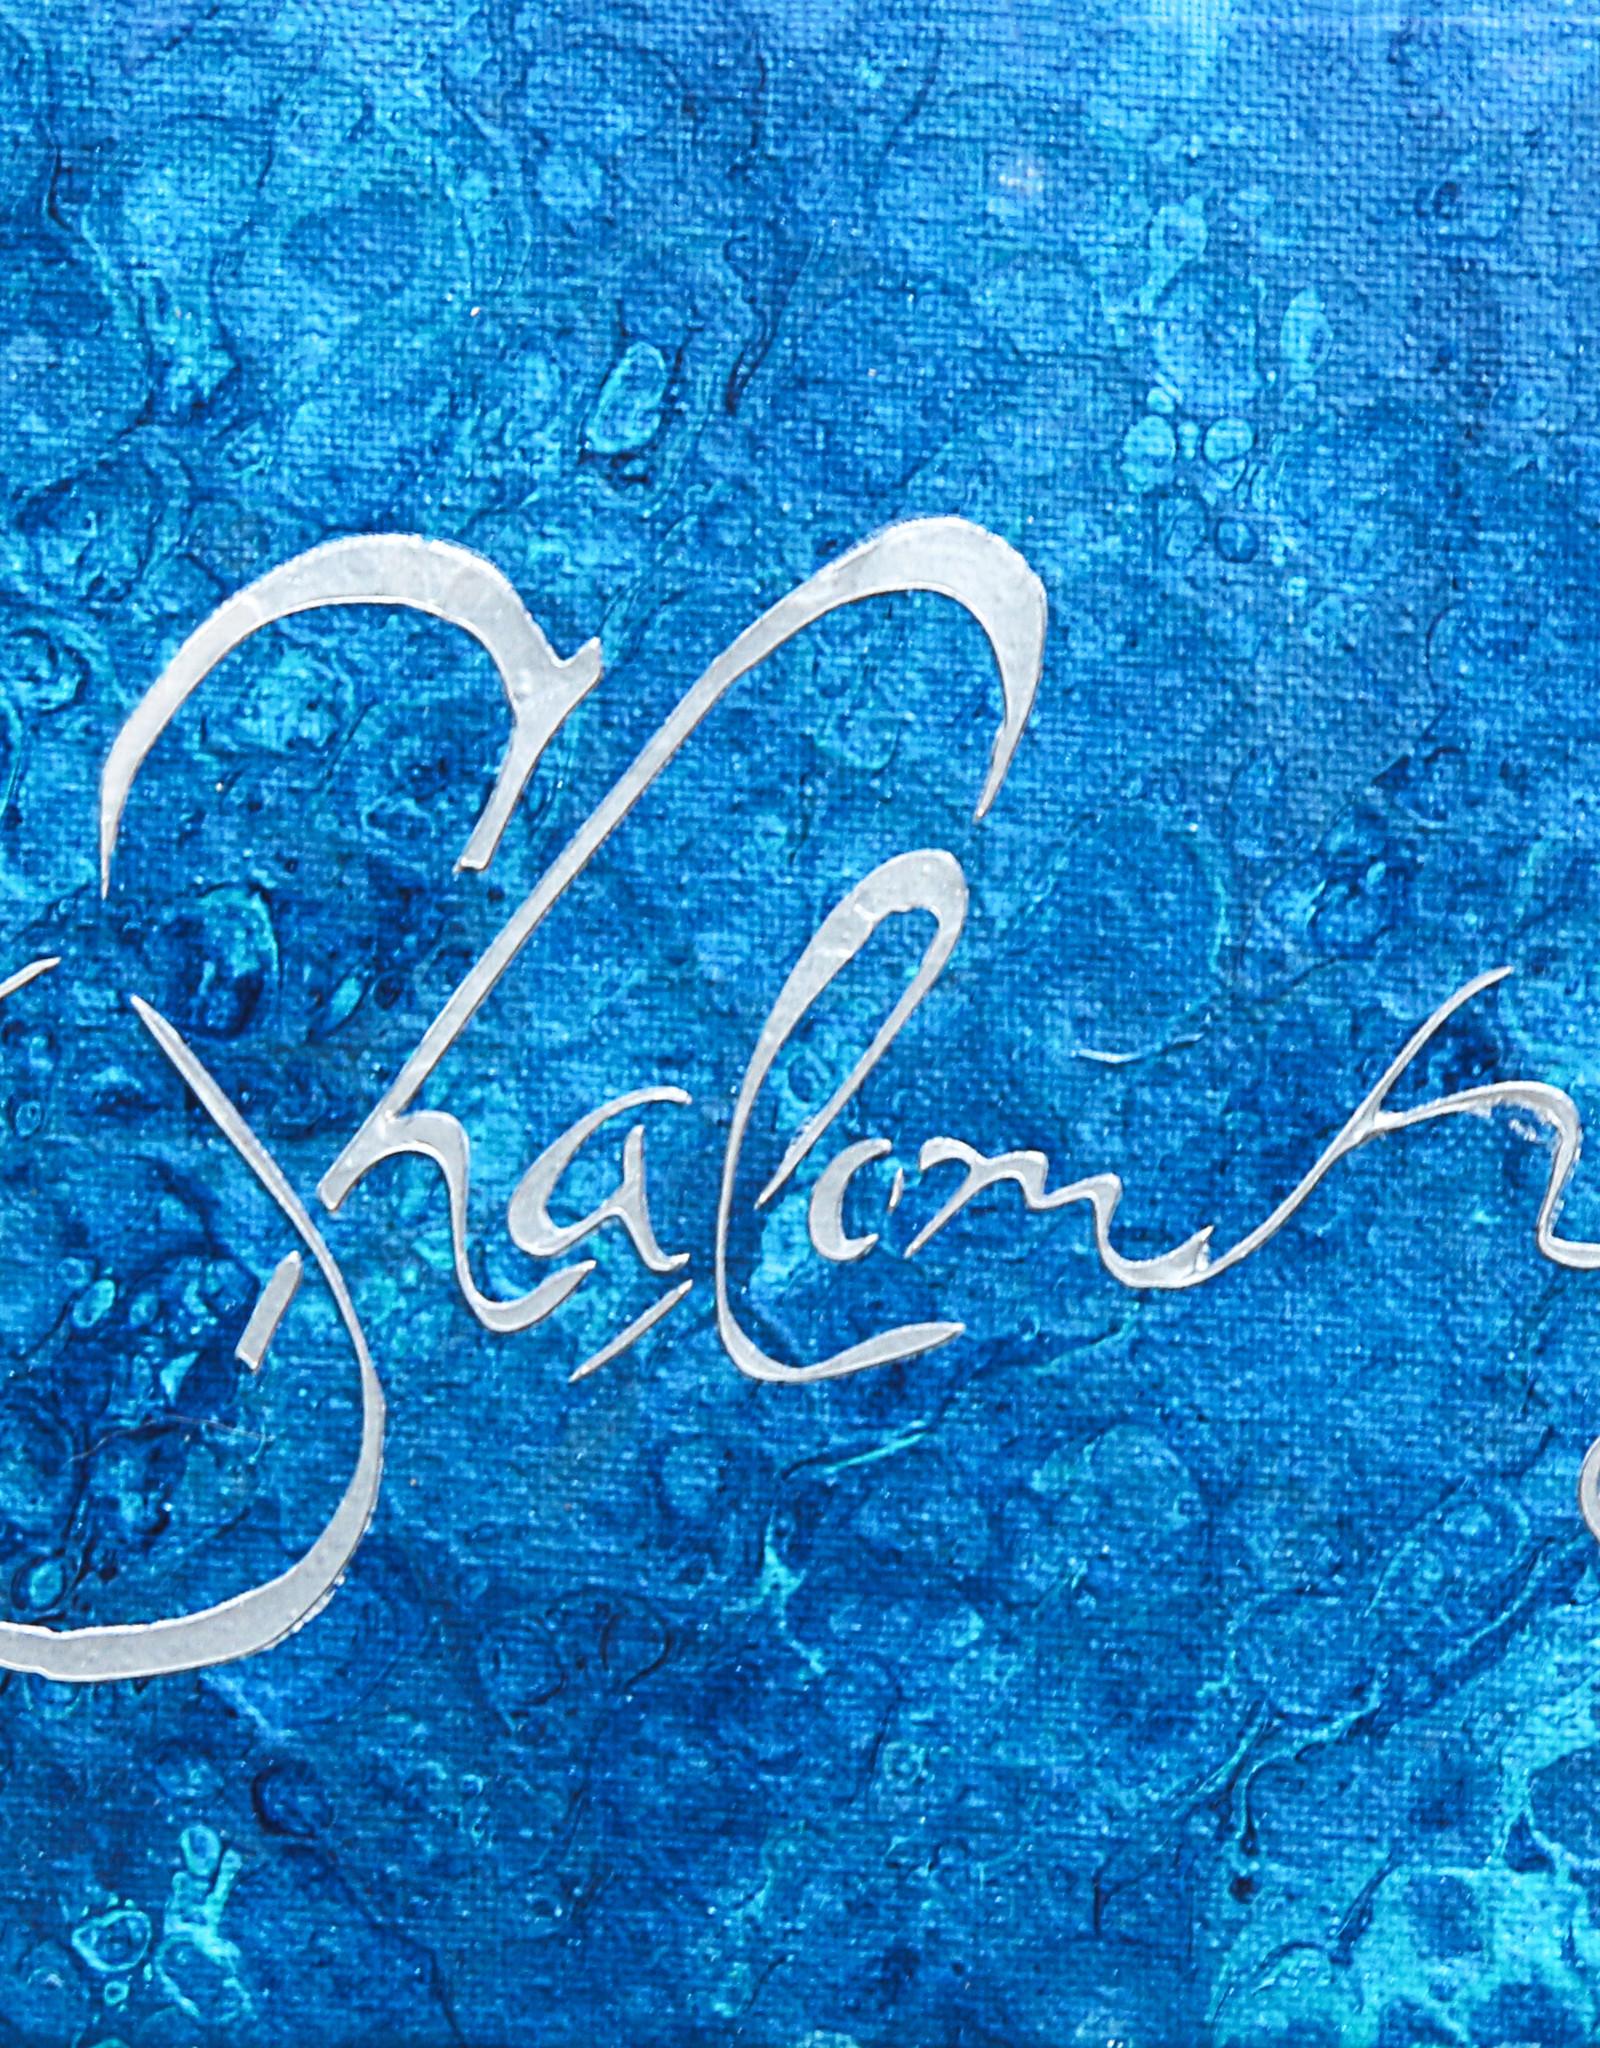 Chaipainter Shalom schilderij, origineel kunstwerk